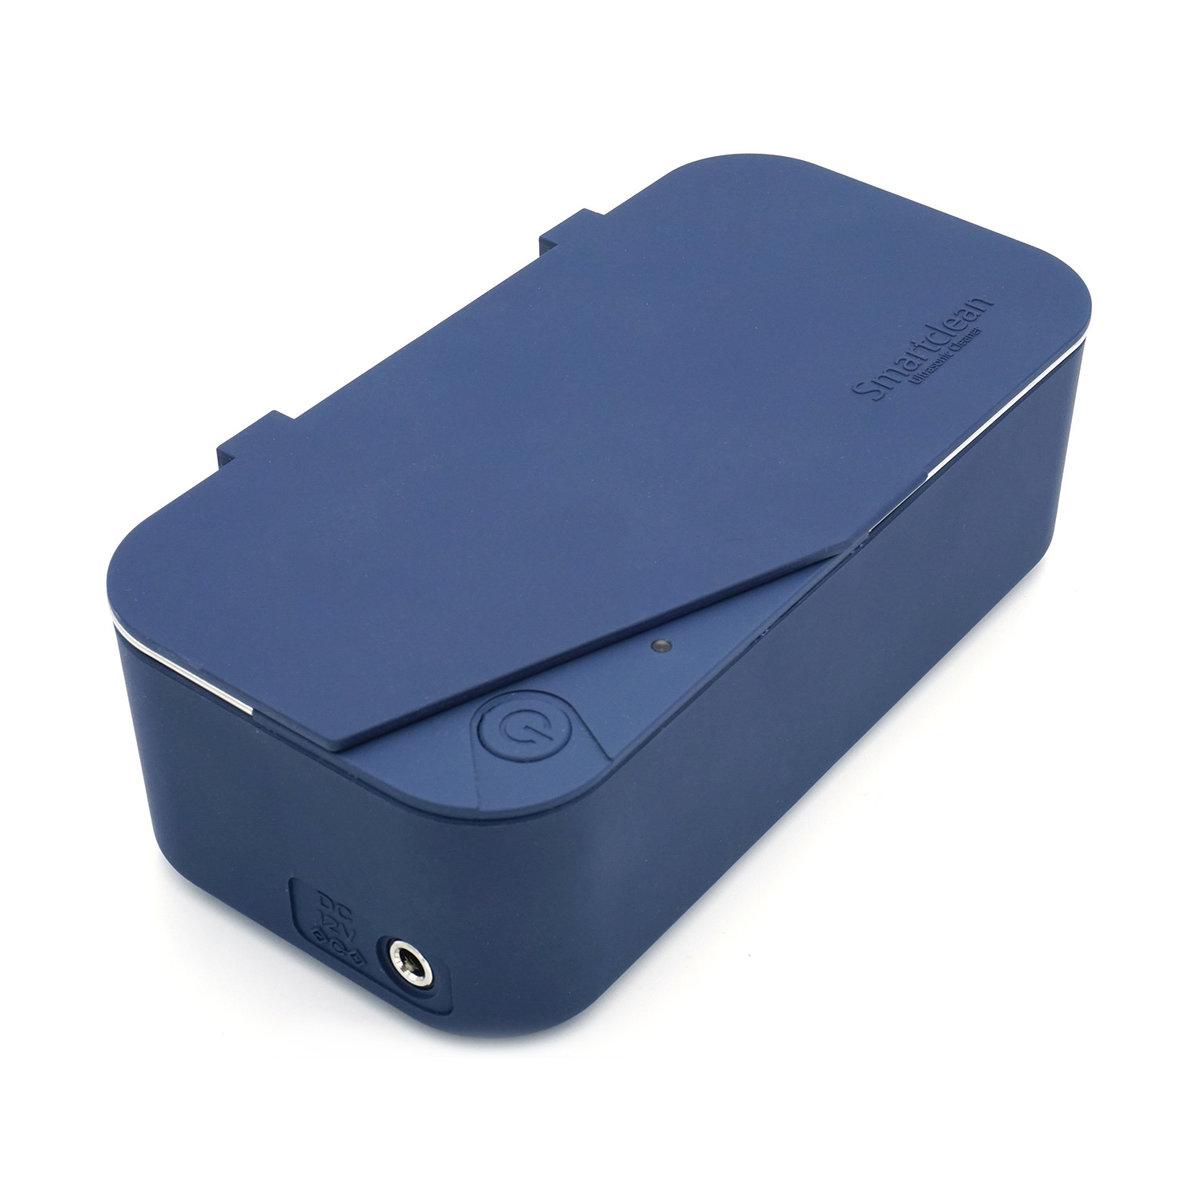 Smartclean 「亮睛睛」超聲波眼鏡清洗機 Vison.5 - 深藍色